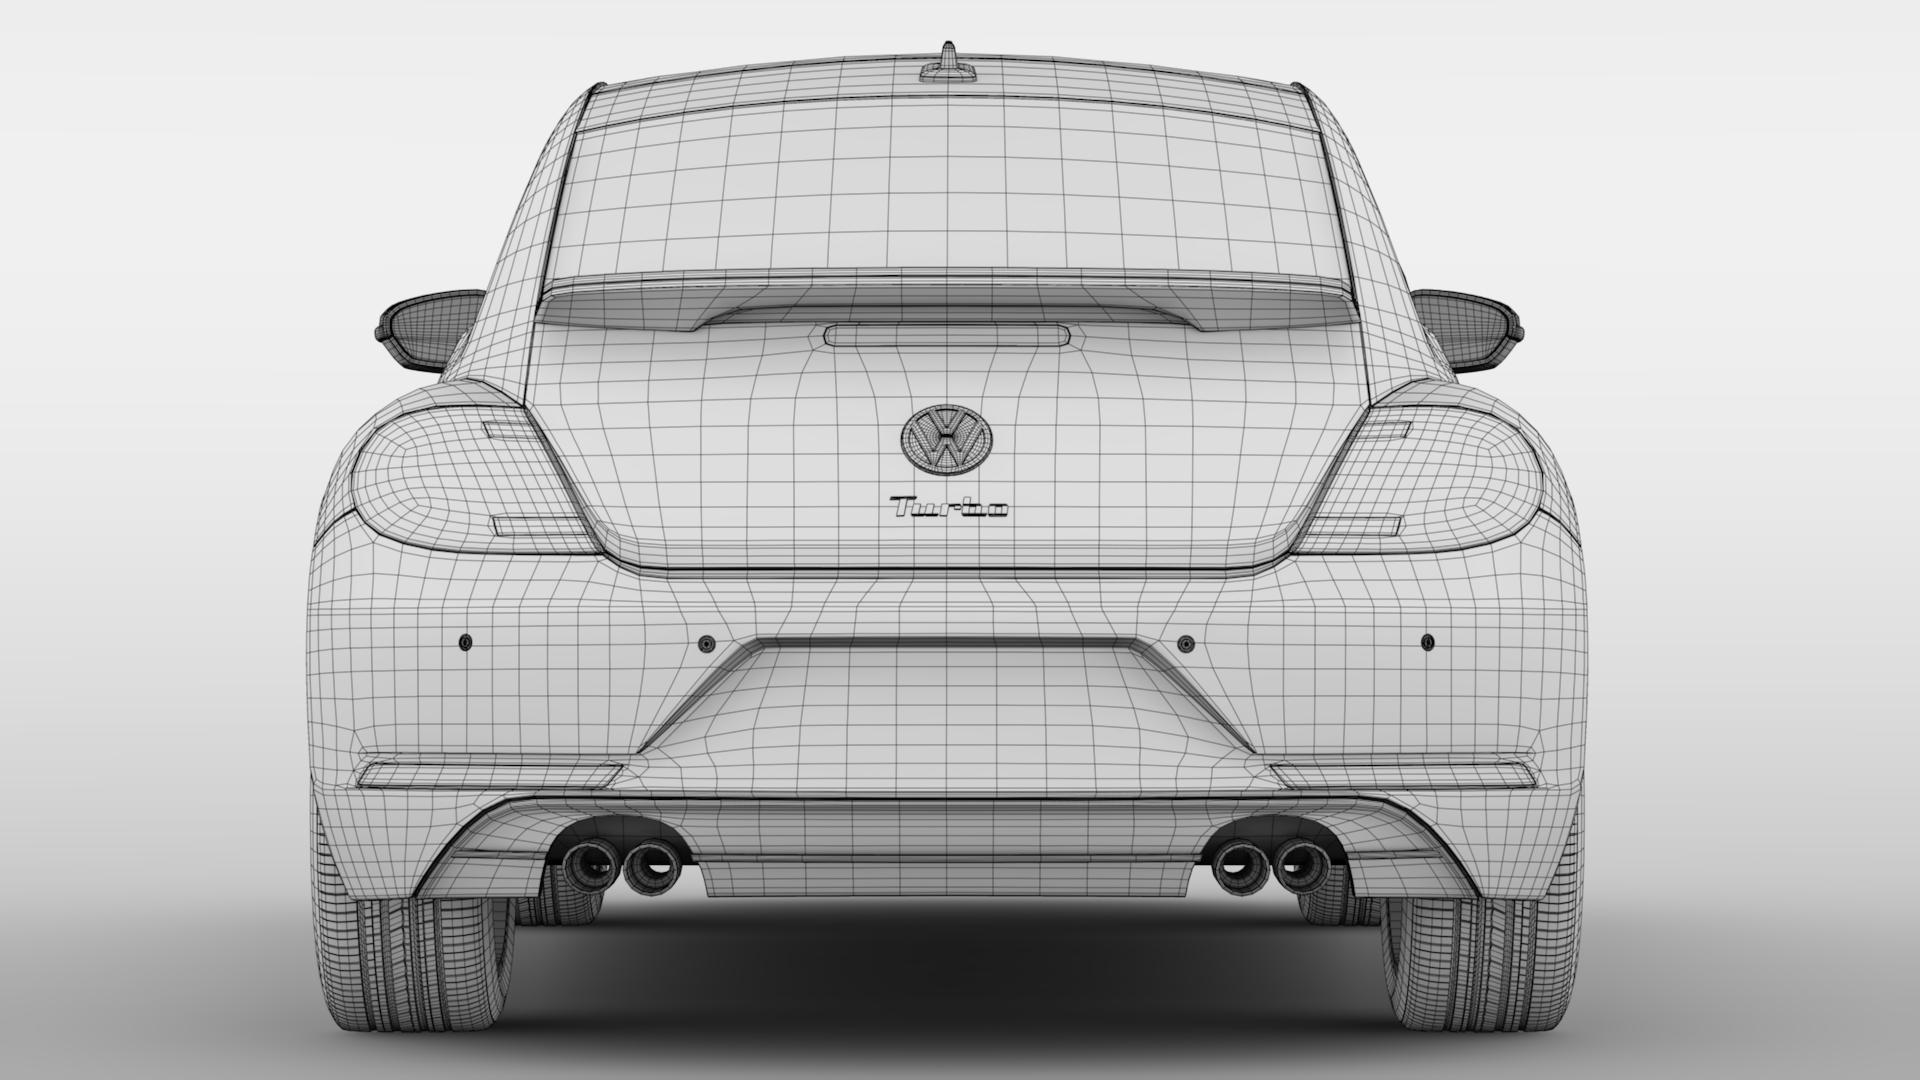 vw beetle turbo 2017 3d model 3ds max fbx c4d lwo ma mb hrc xsi obj 221677